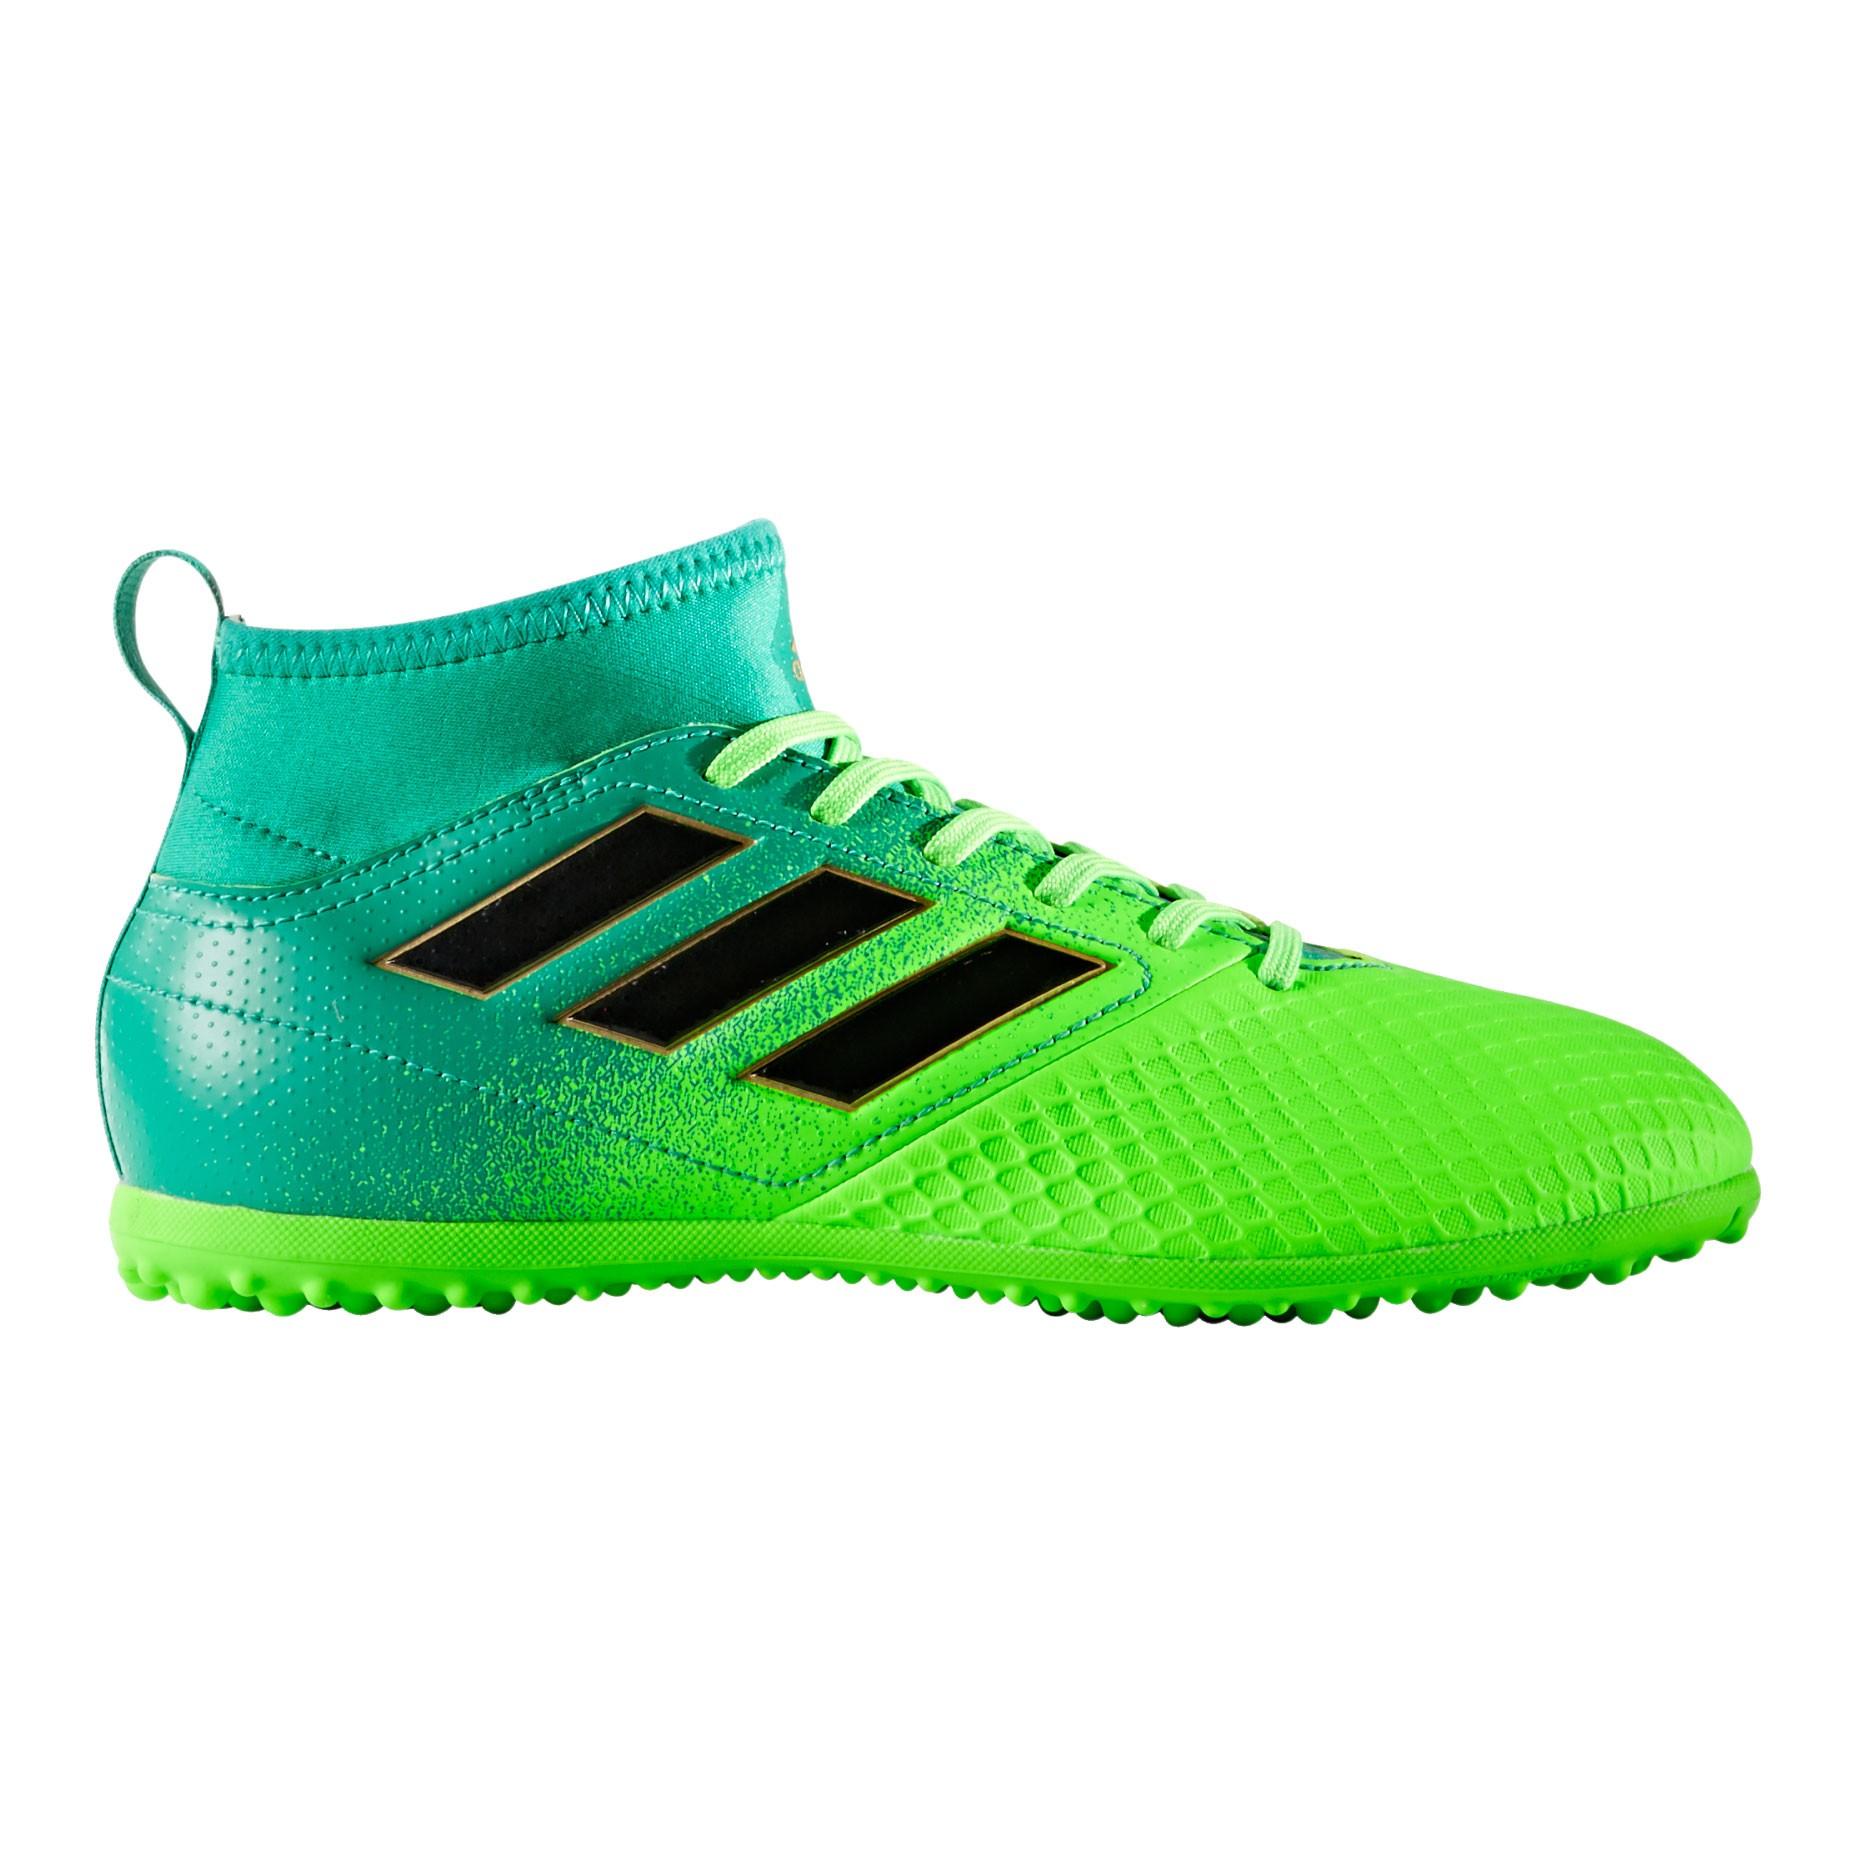 Afbeelding van Adidas Ace 17.3 Primemesh TF BB1000 Voetbalschoenen Junior Solar Green Core Black